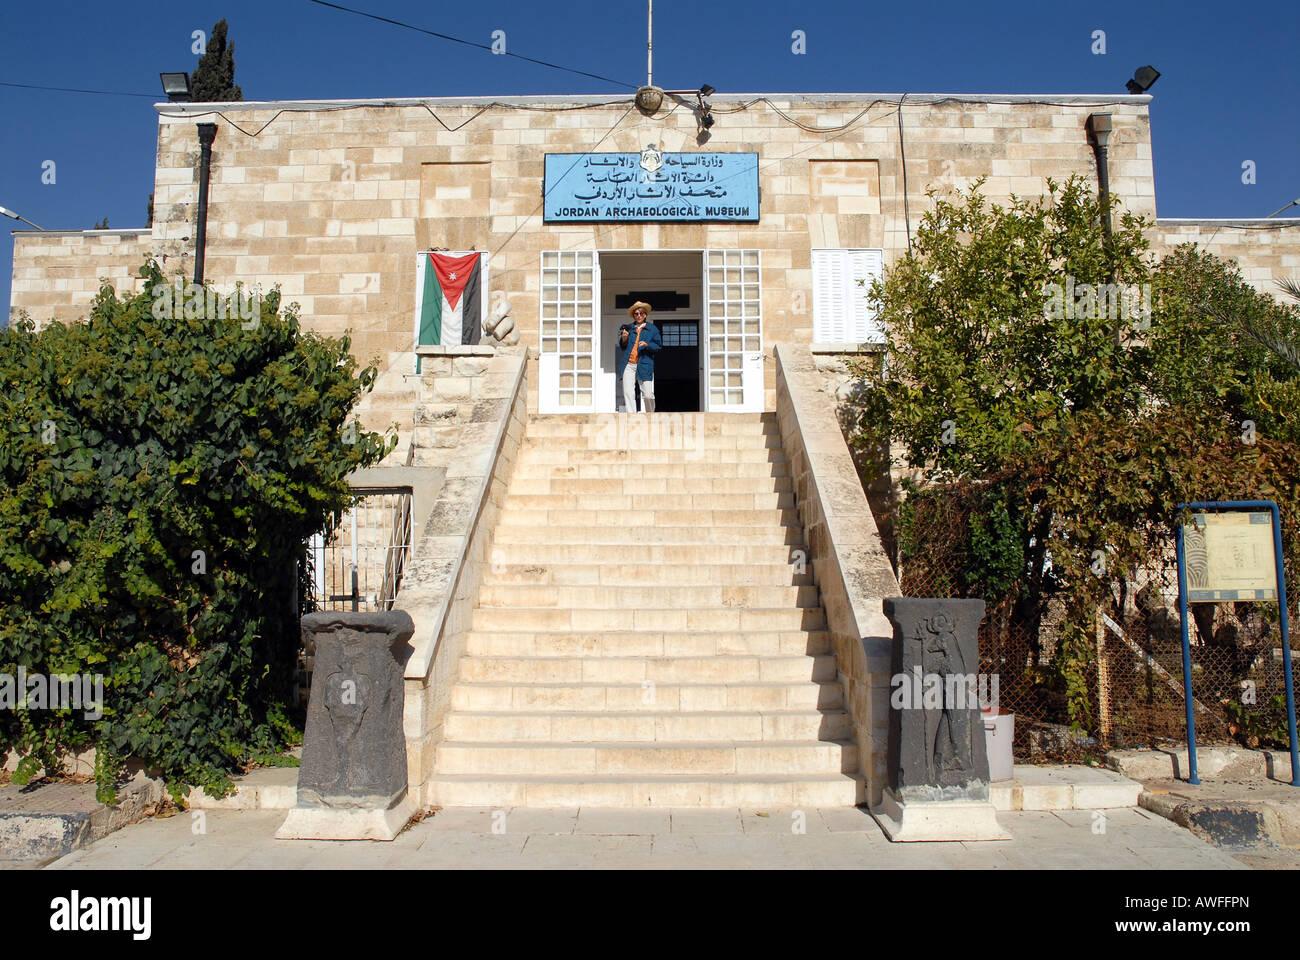 The Archaeological Museum, Jebel al-Qala, Amman, Jordan Stock Photo